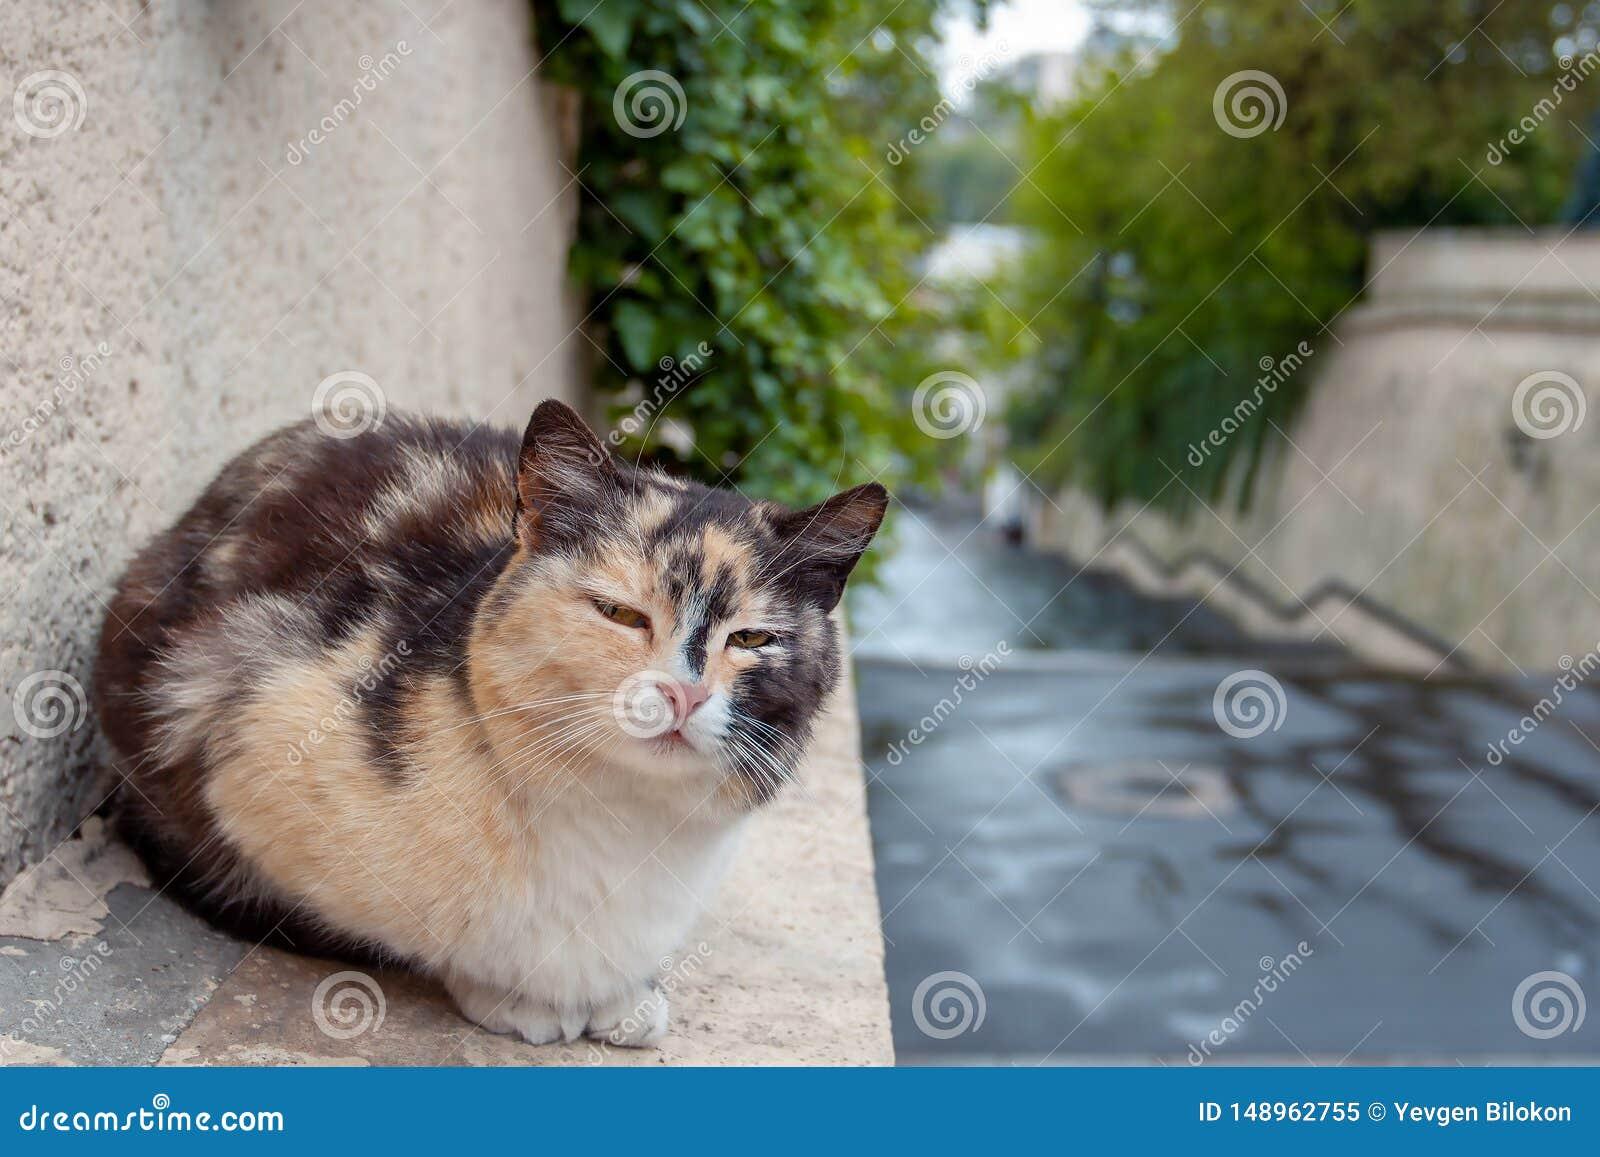 Gato disperso apenas na rua ap?s a chuva